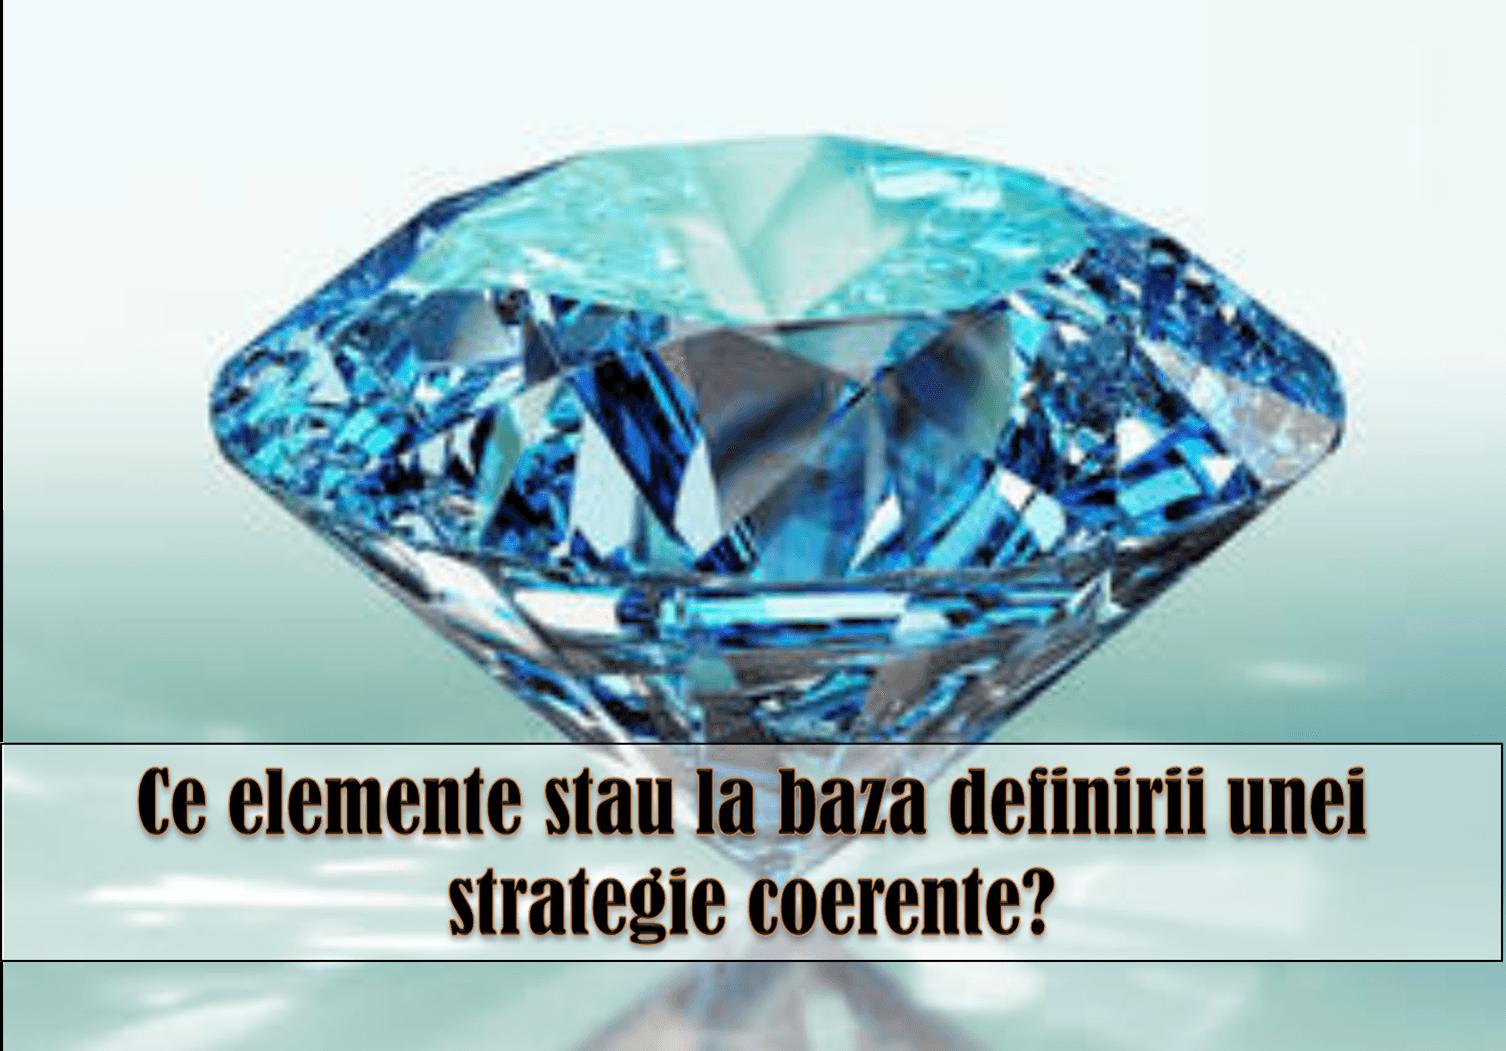 diamantul strategic; elaborarea decizilor; elementele strategiei unitare